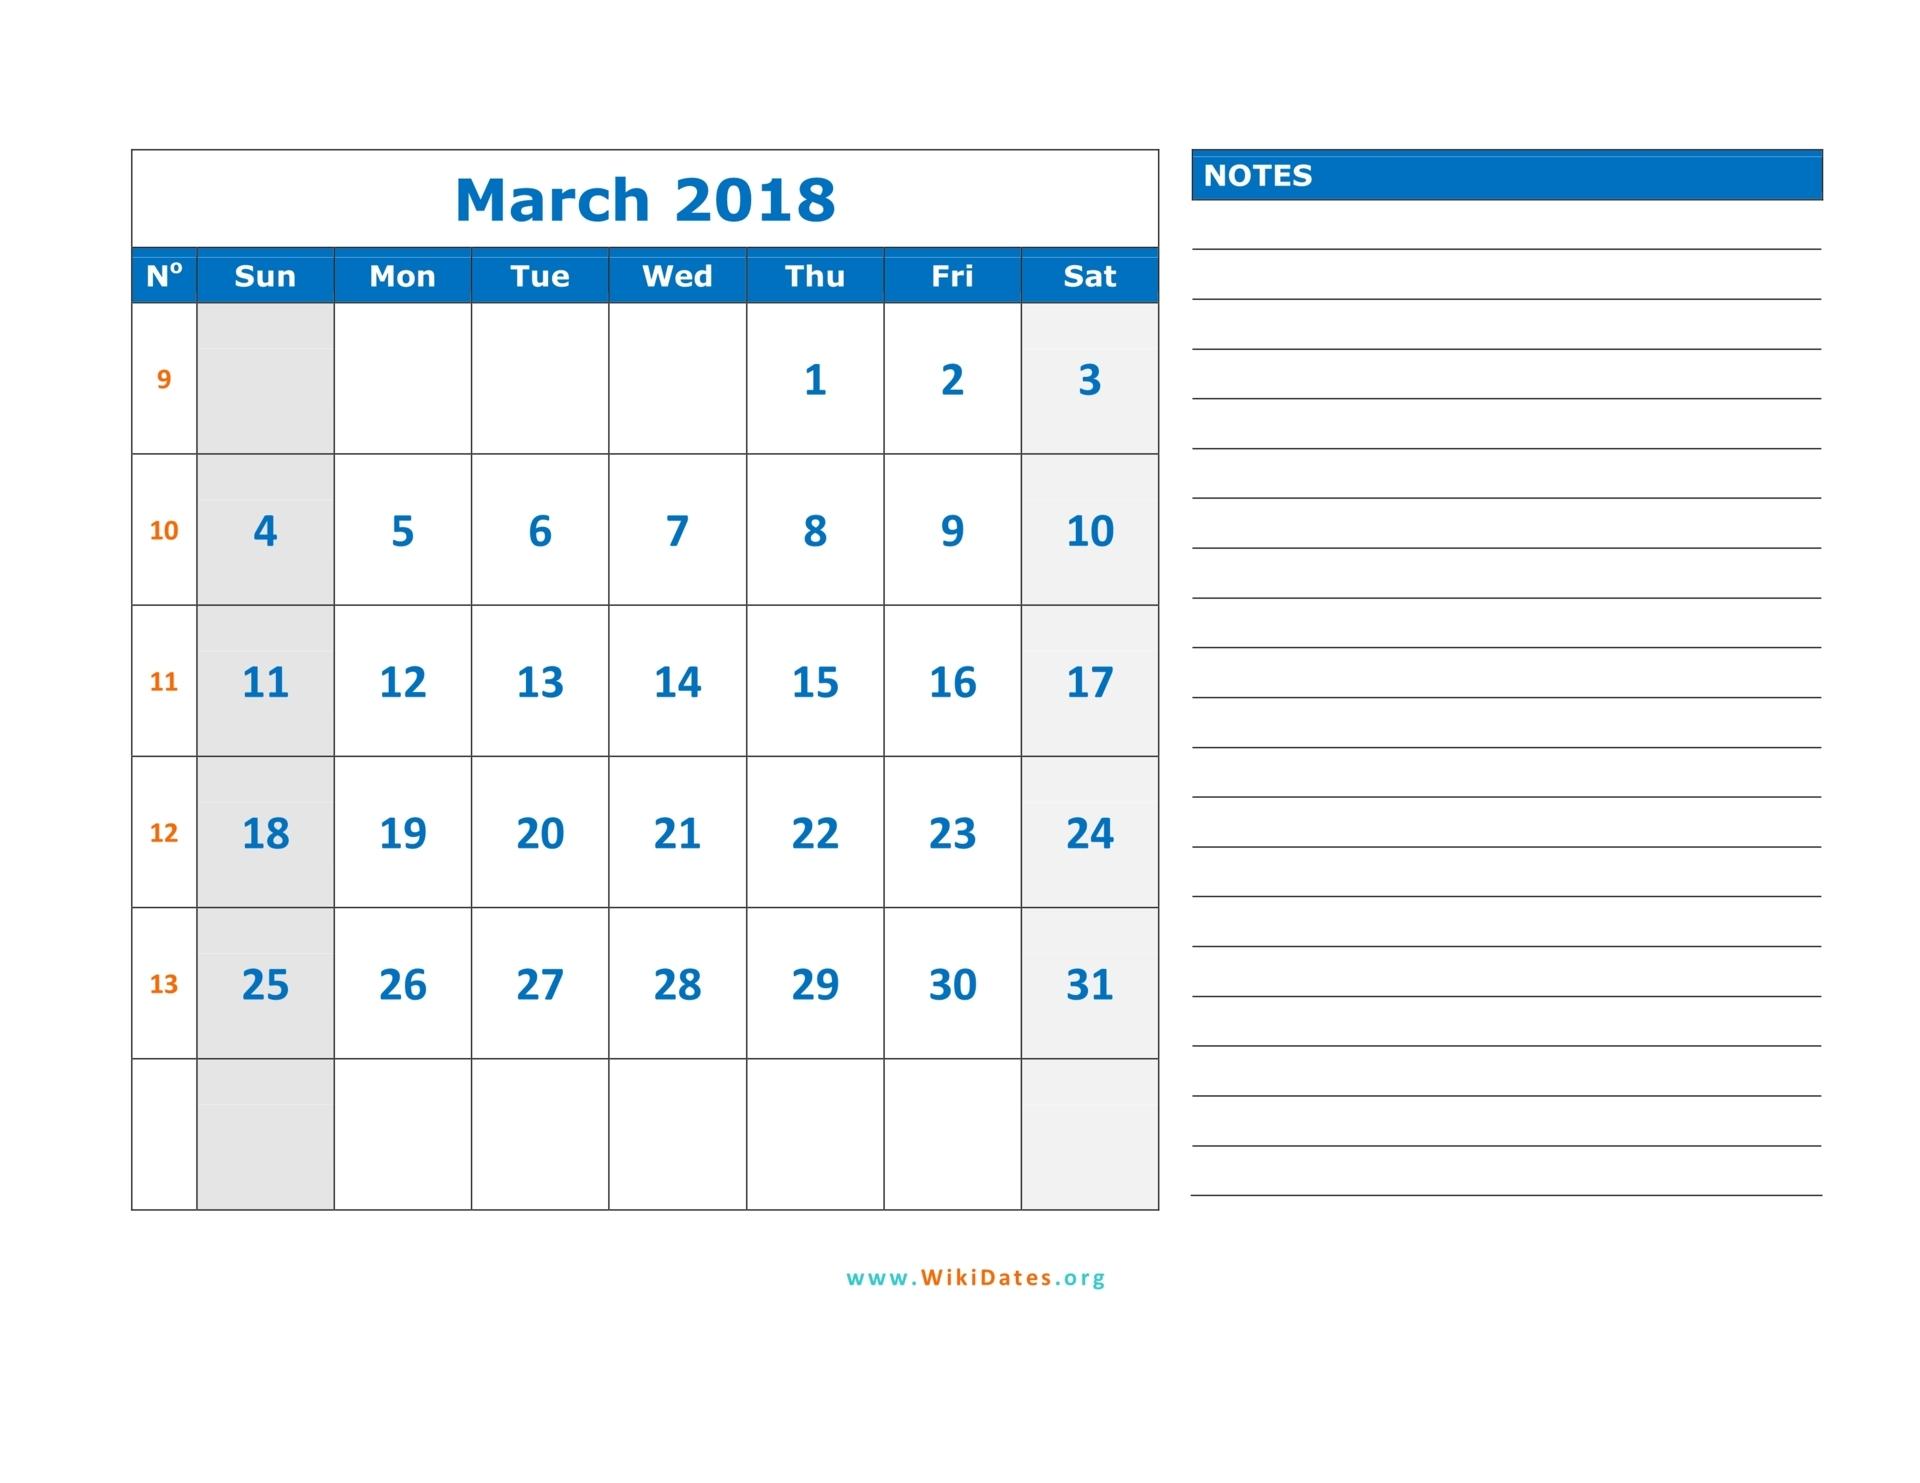 March 2018 Calendar | WikiDates.org